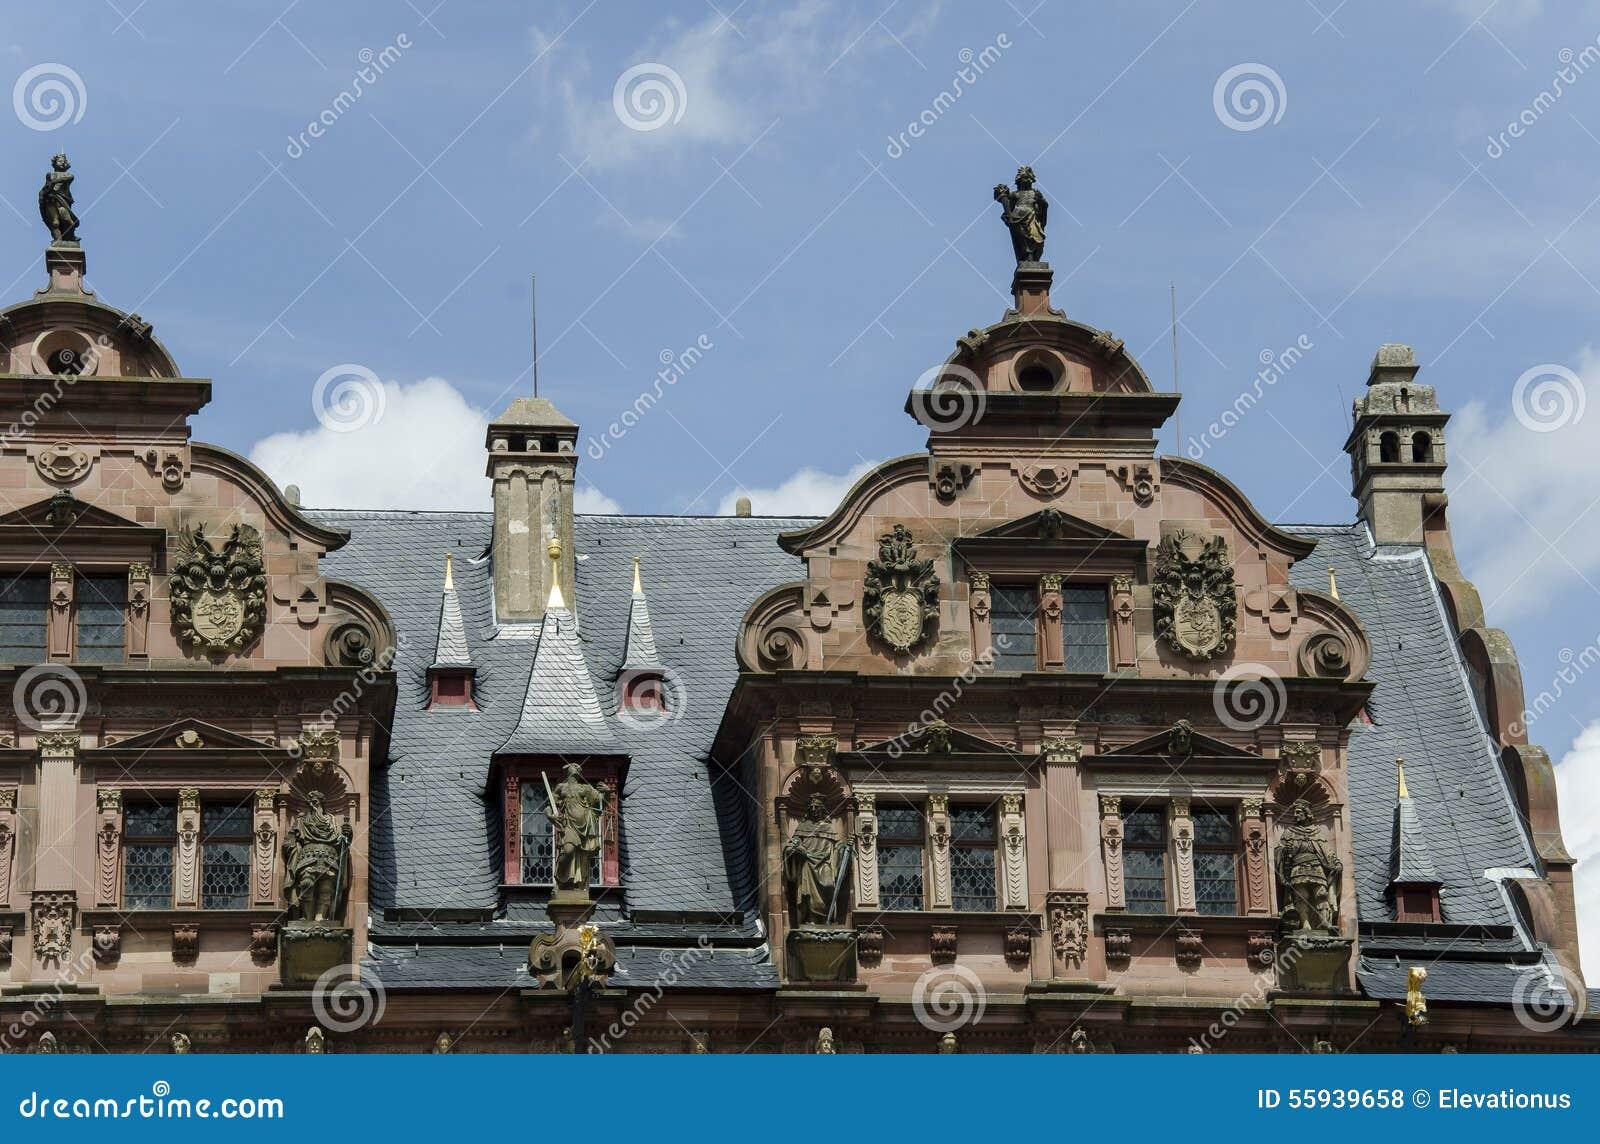 Kasteel van Heidelberg (Heidelberger Schloss)